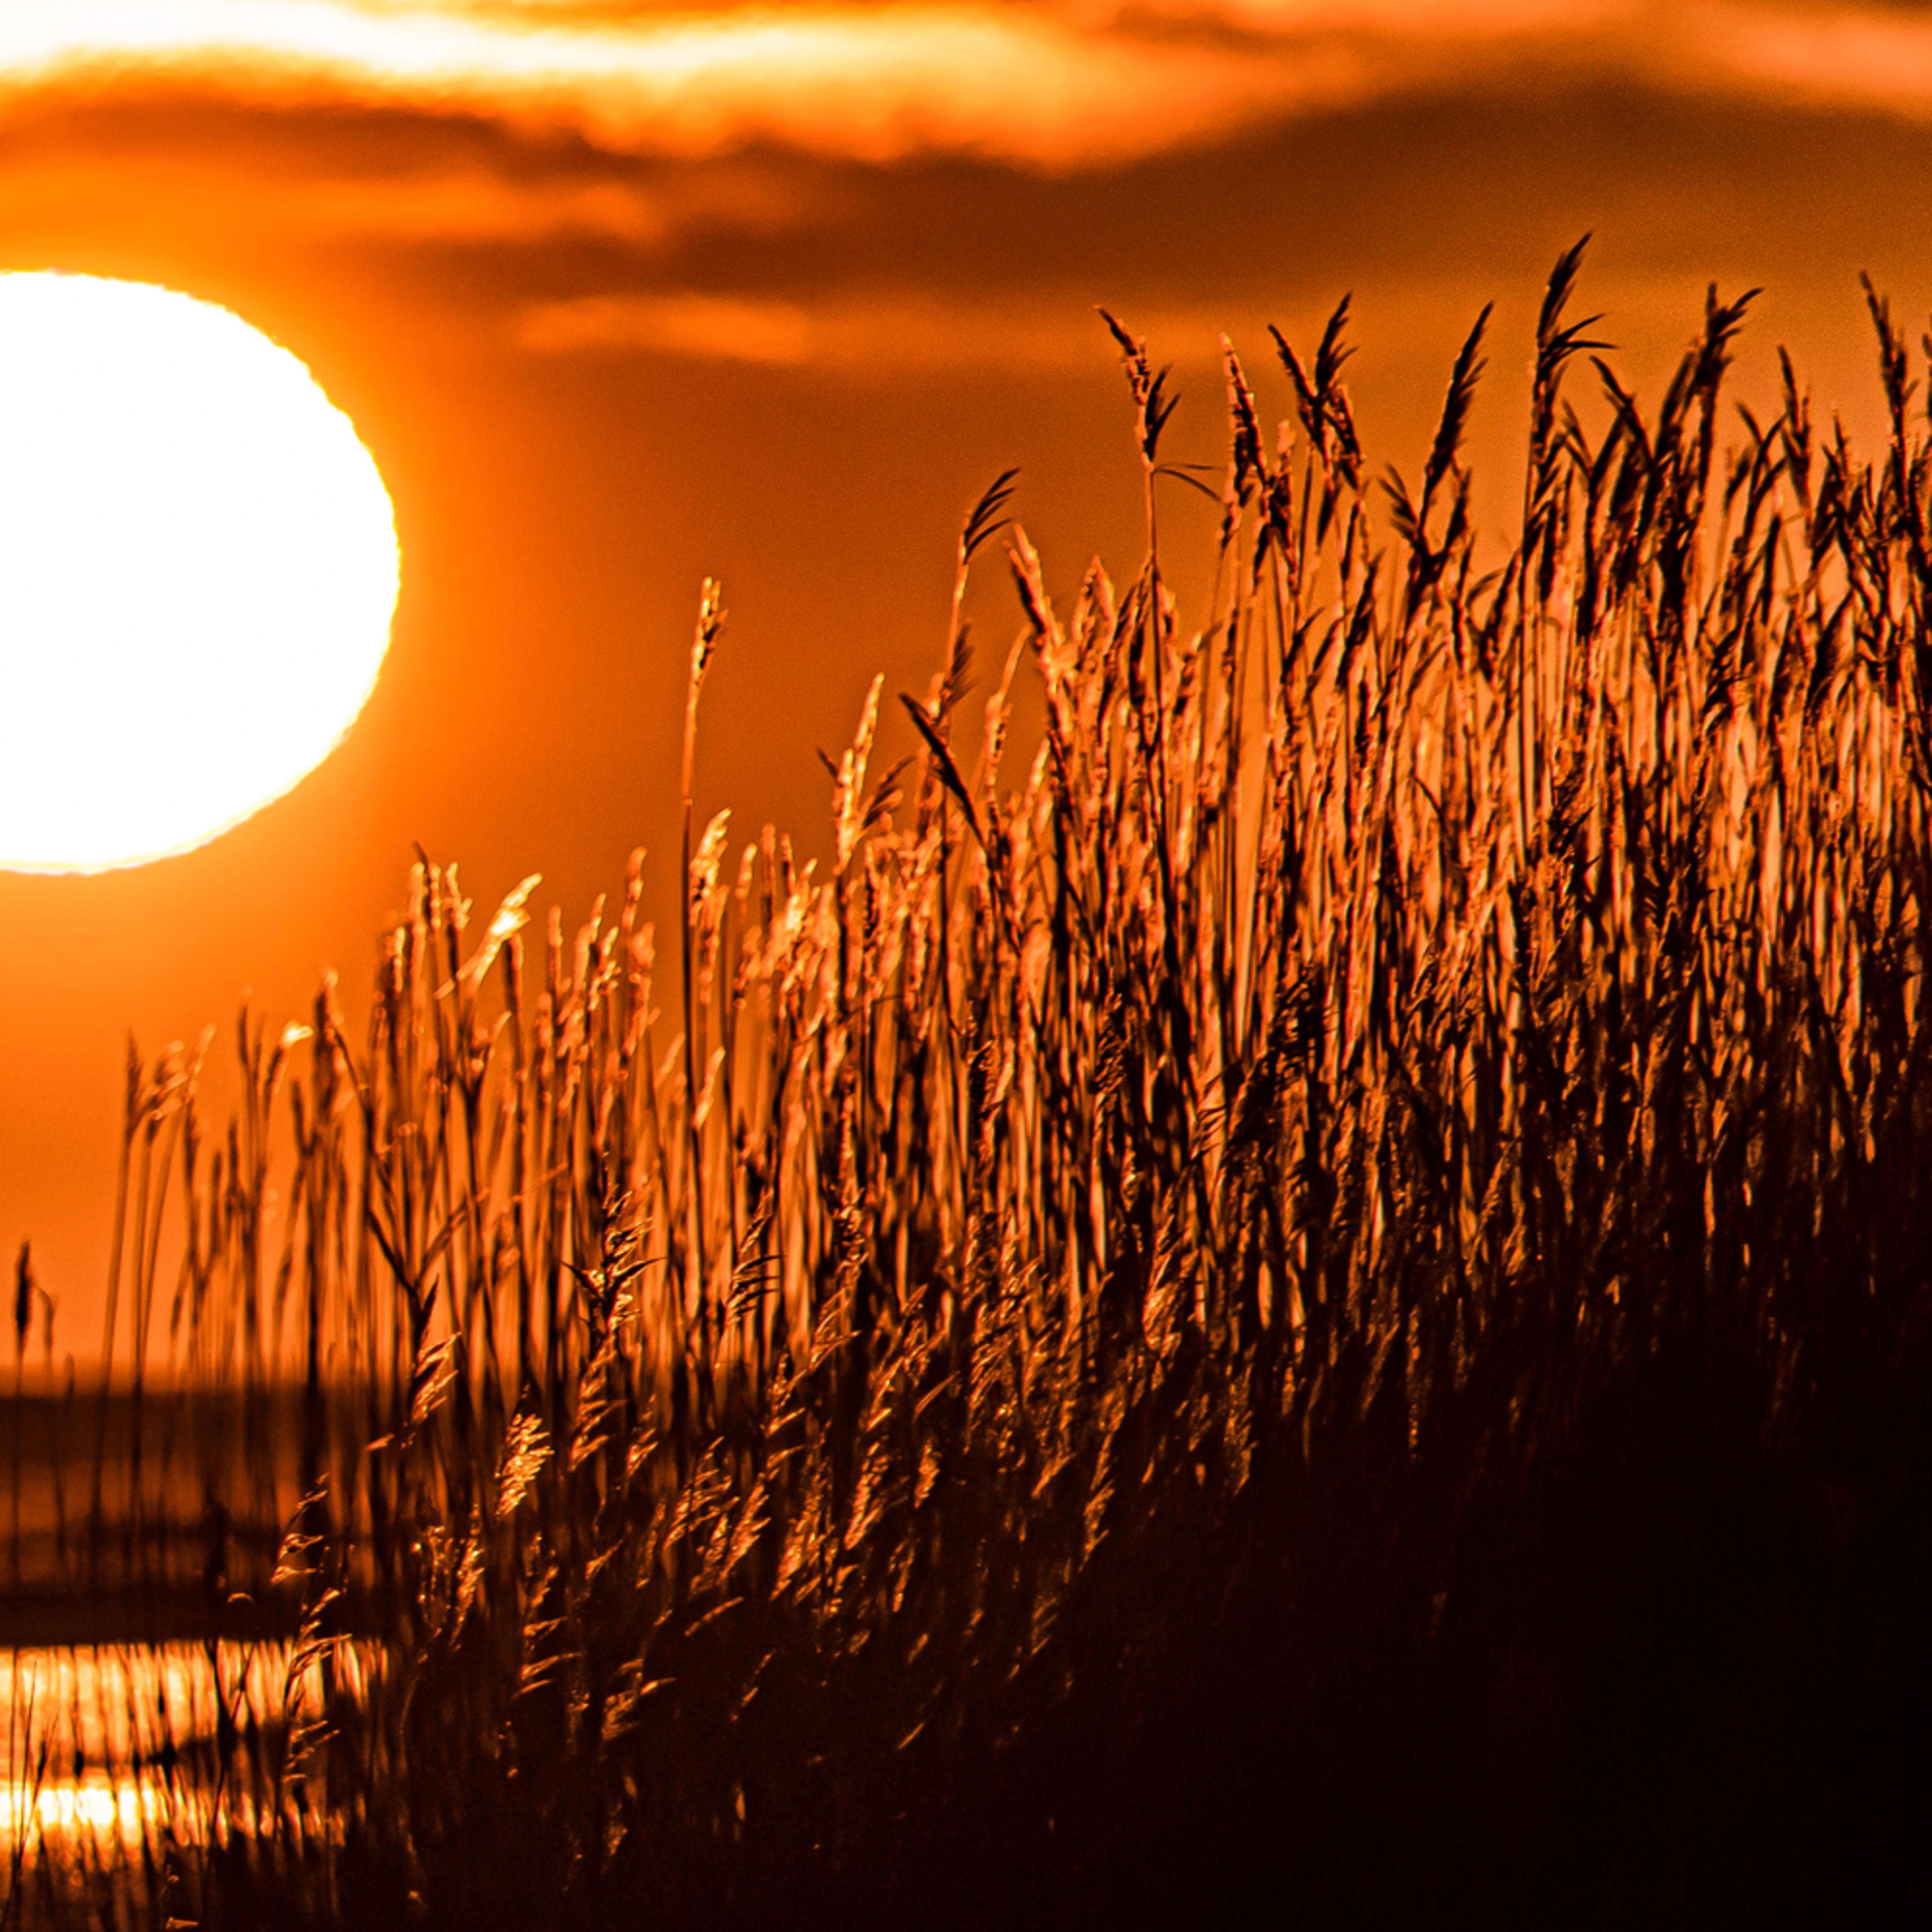 Qunasoo winter reeds sunrise mwyvzk